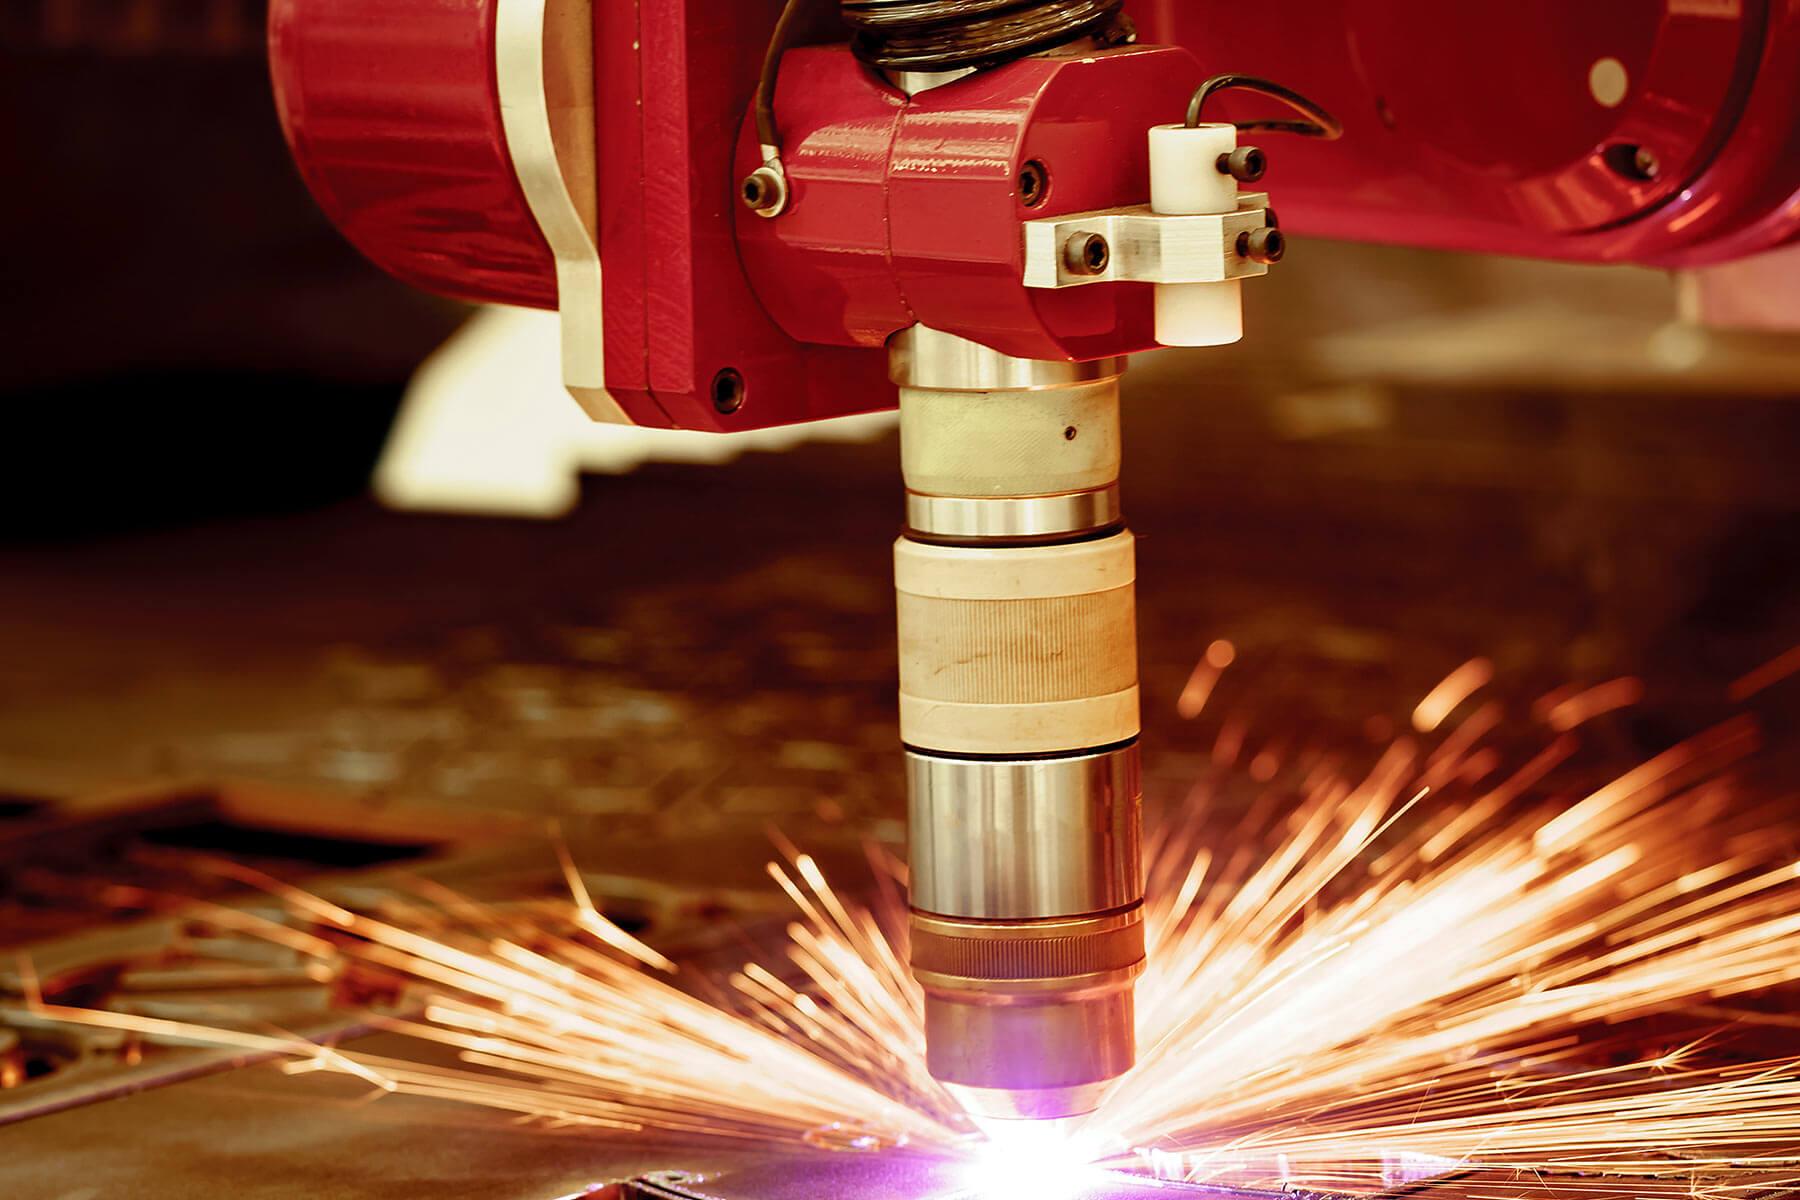 laser plasma cutting sparks up close